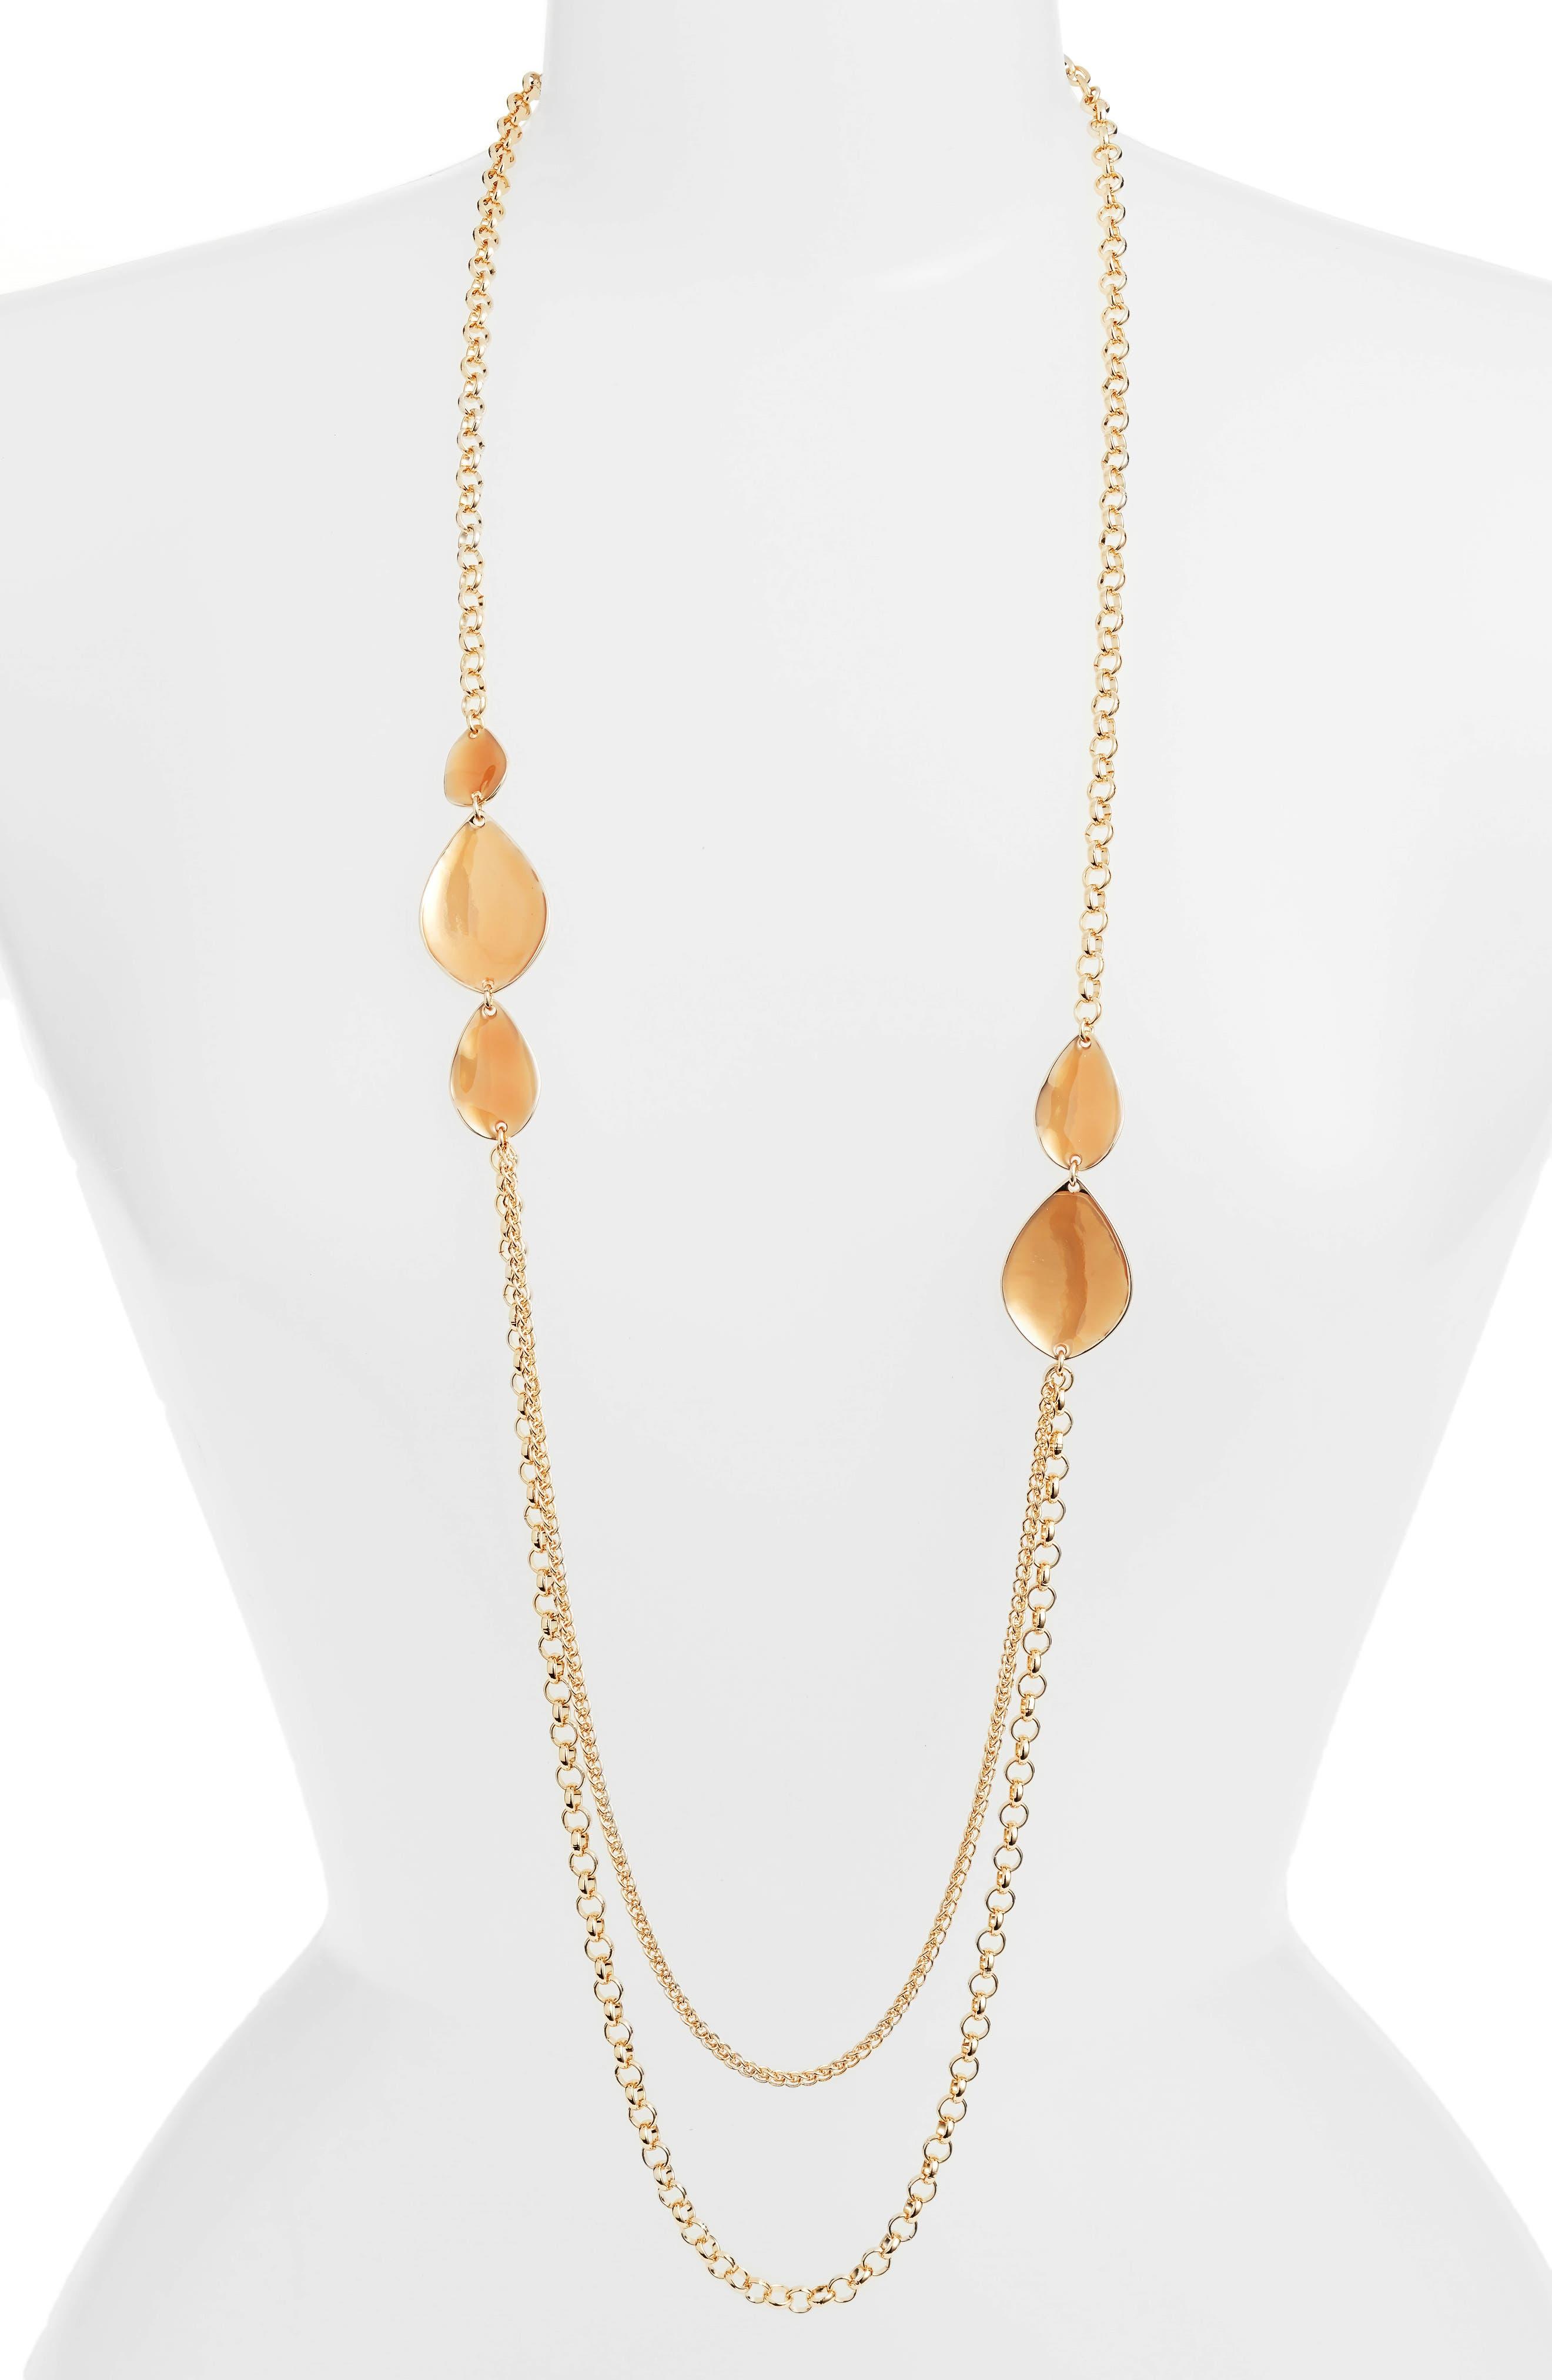 Painted Petal Draped Long Necklace,                             Main thumbnail 1, color,                             Blush- Gold